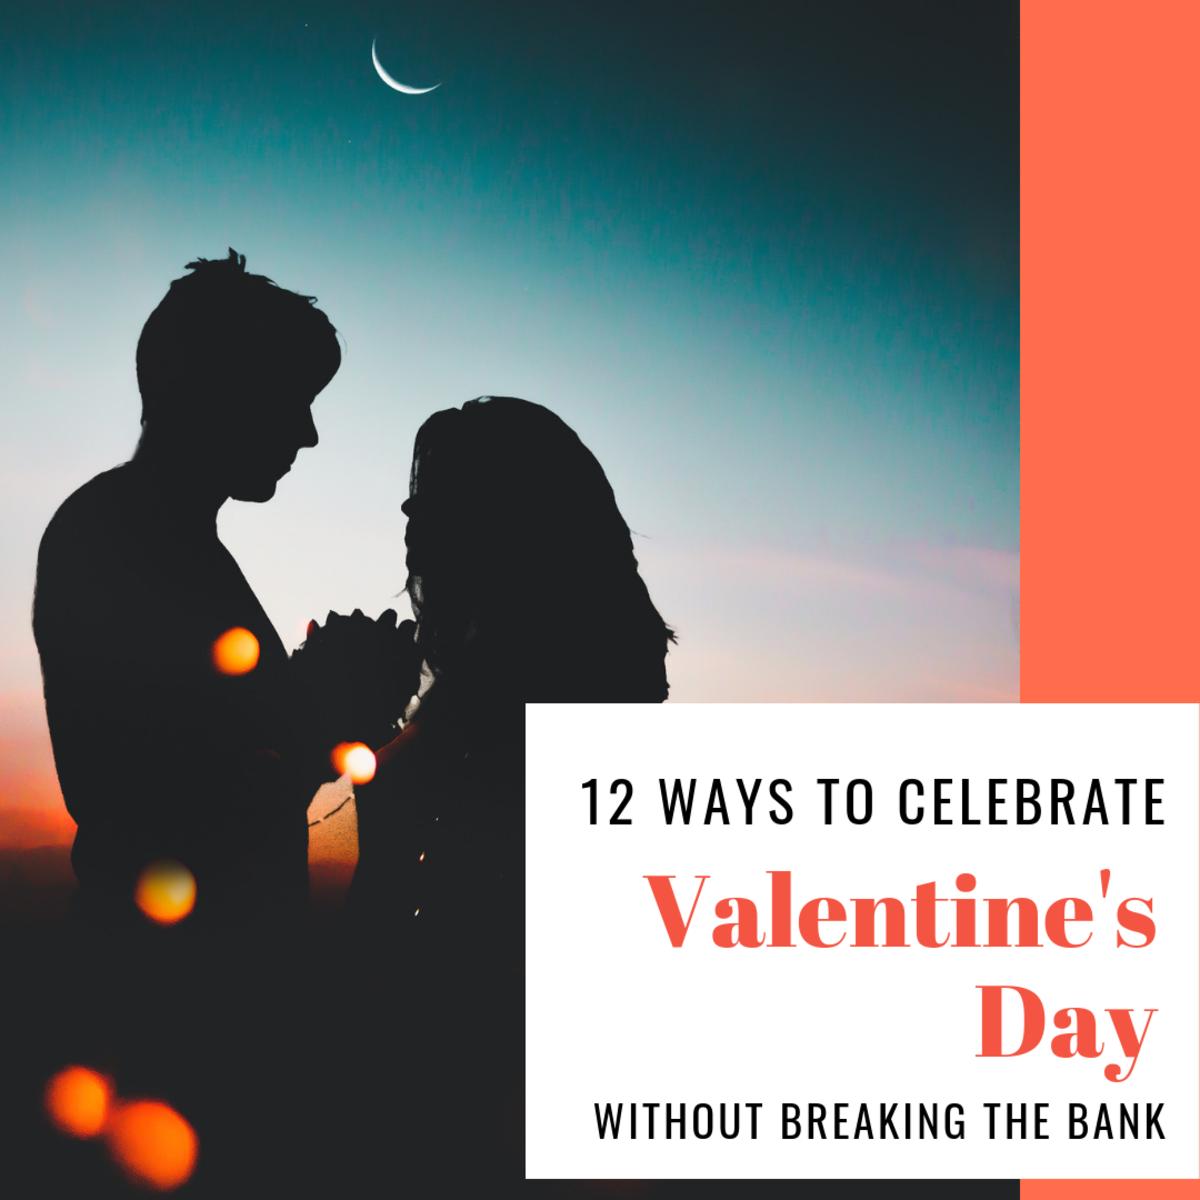 12 Budget-Friendly, Cheap, or Free Ways to Celebrate Valentine's Day